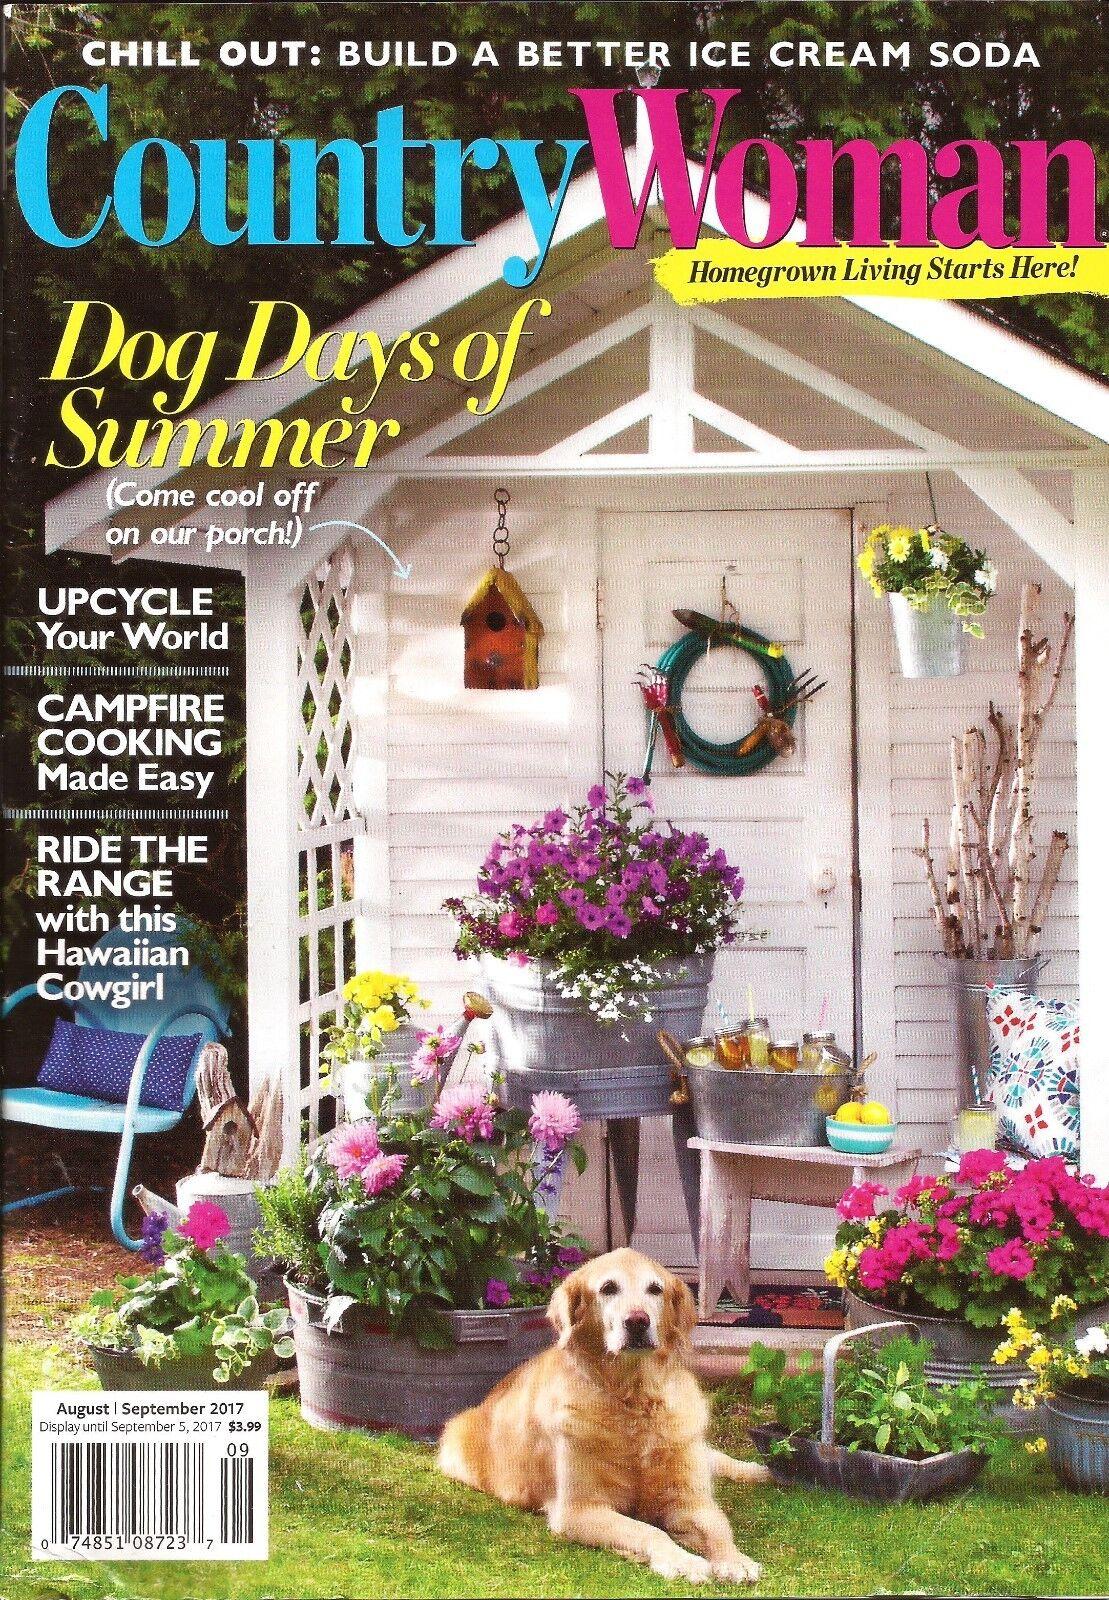 Country Woman Magazine Sept 2017 Upcycling Ideas The Hawaiian